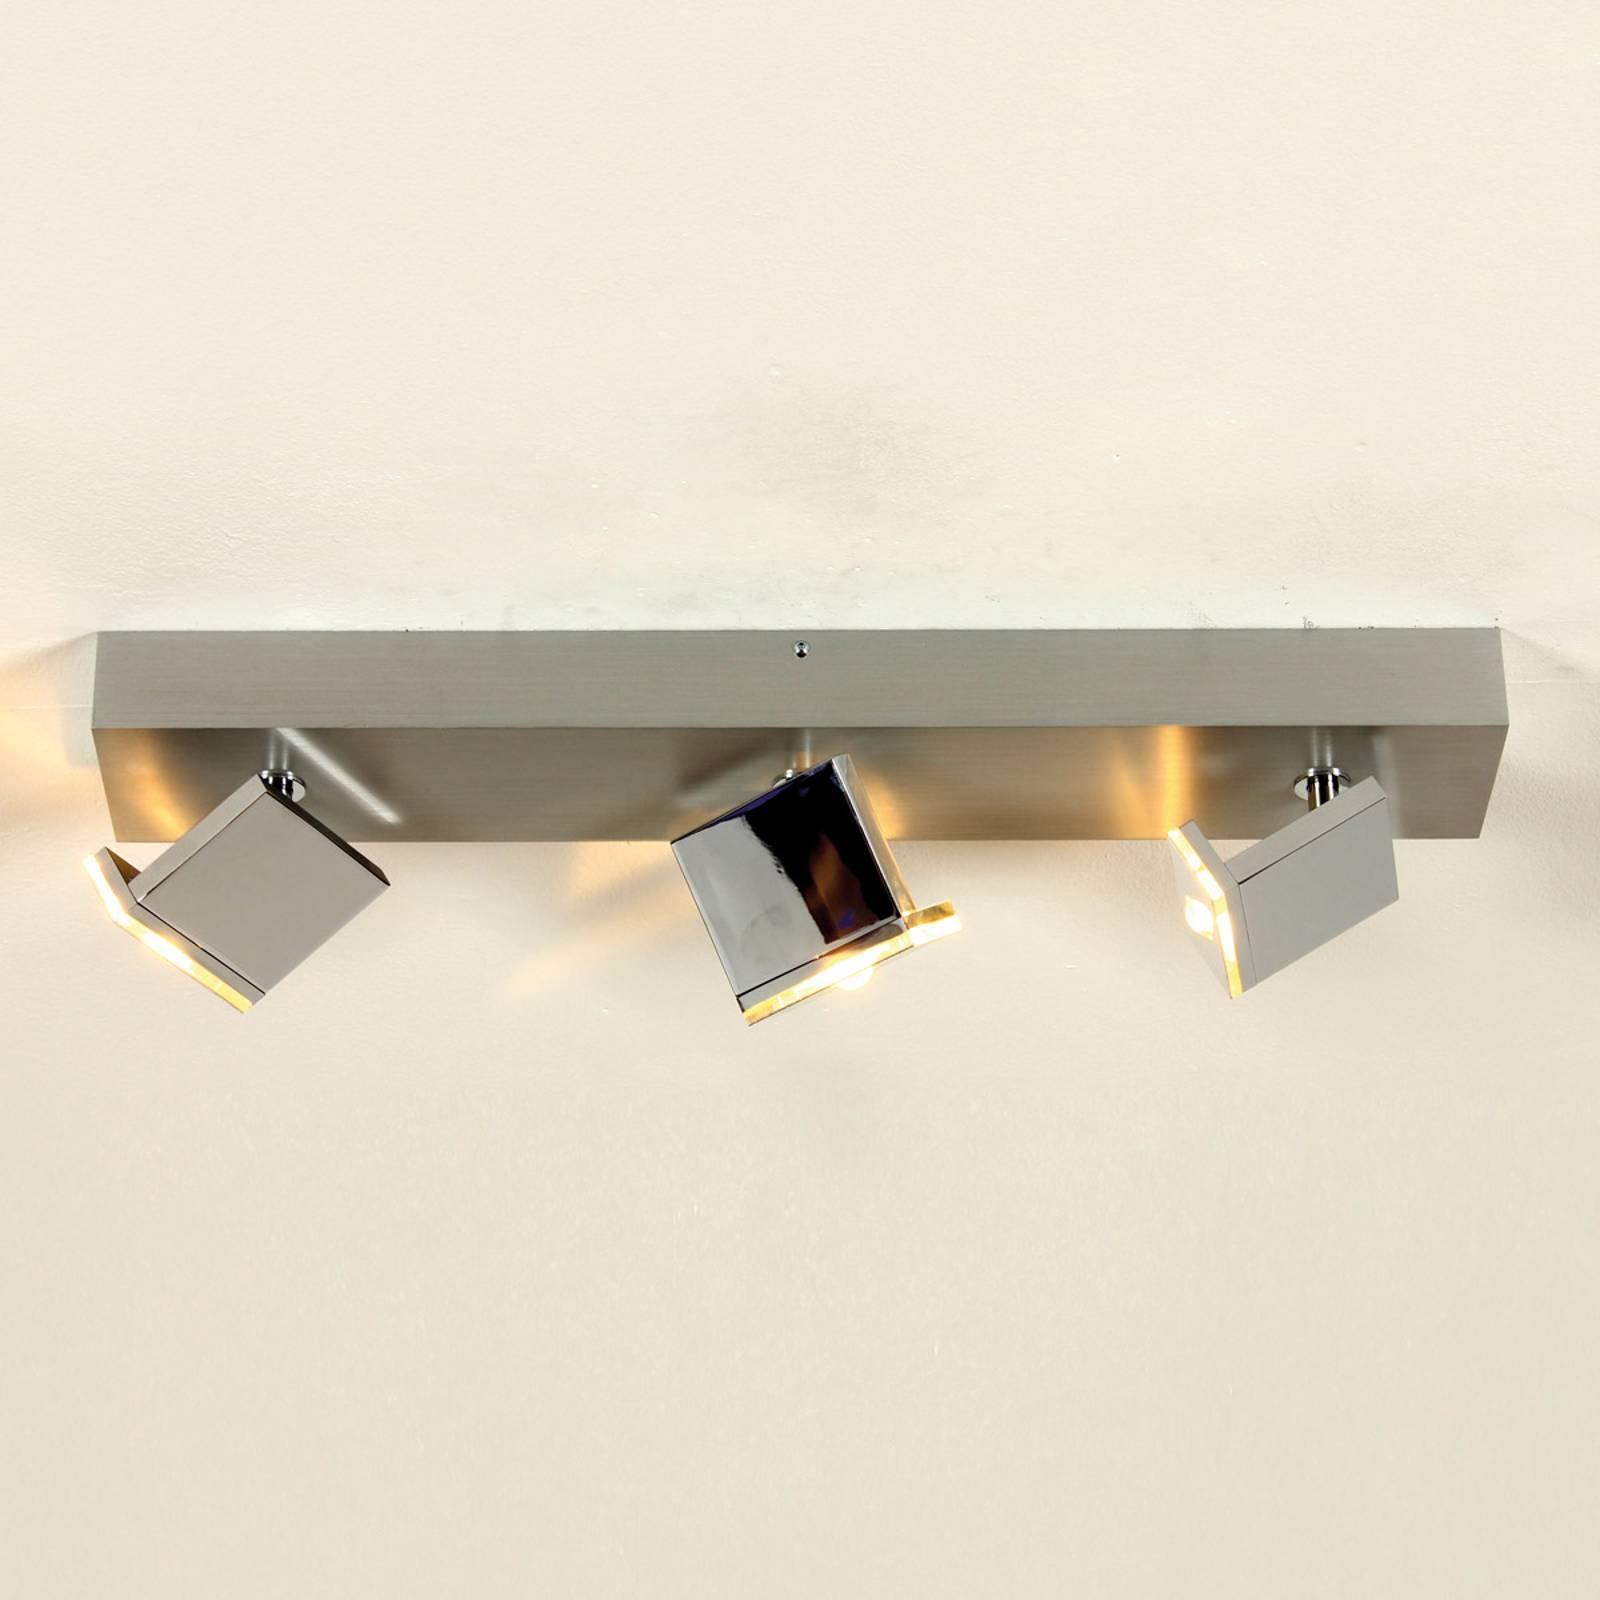 Drielamps LED-plafondlamp Elle, dimbaar